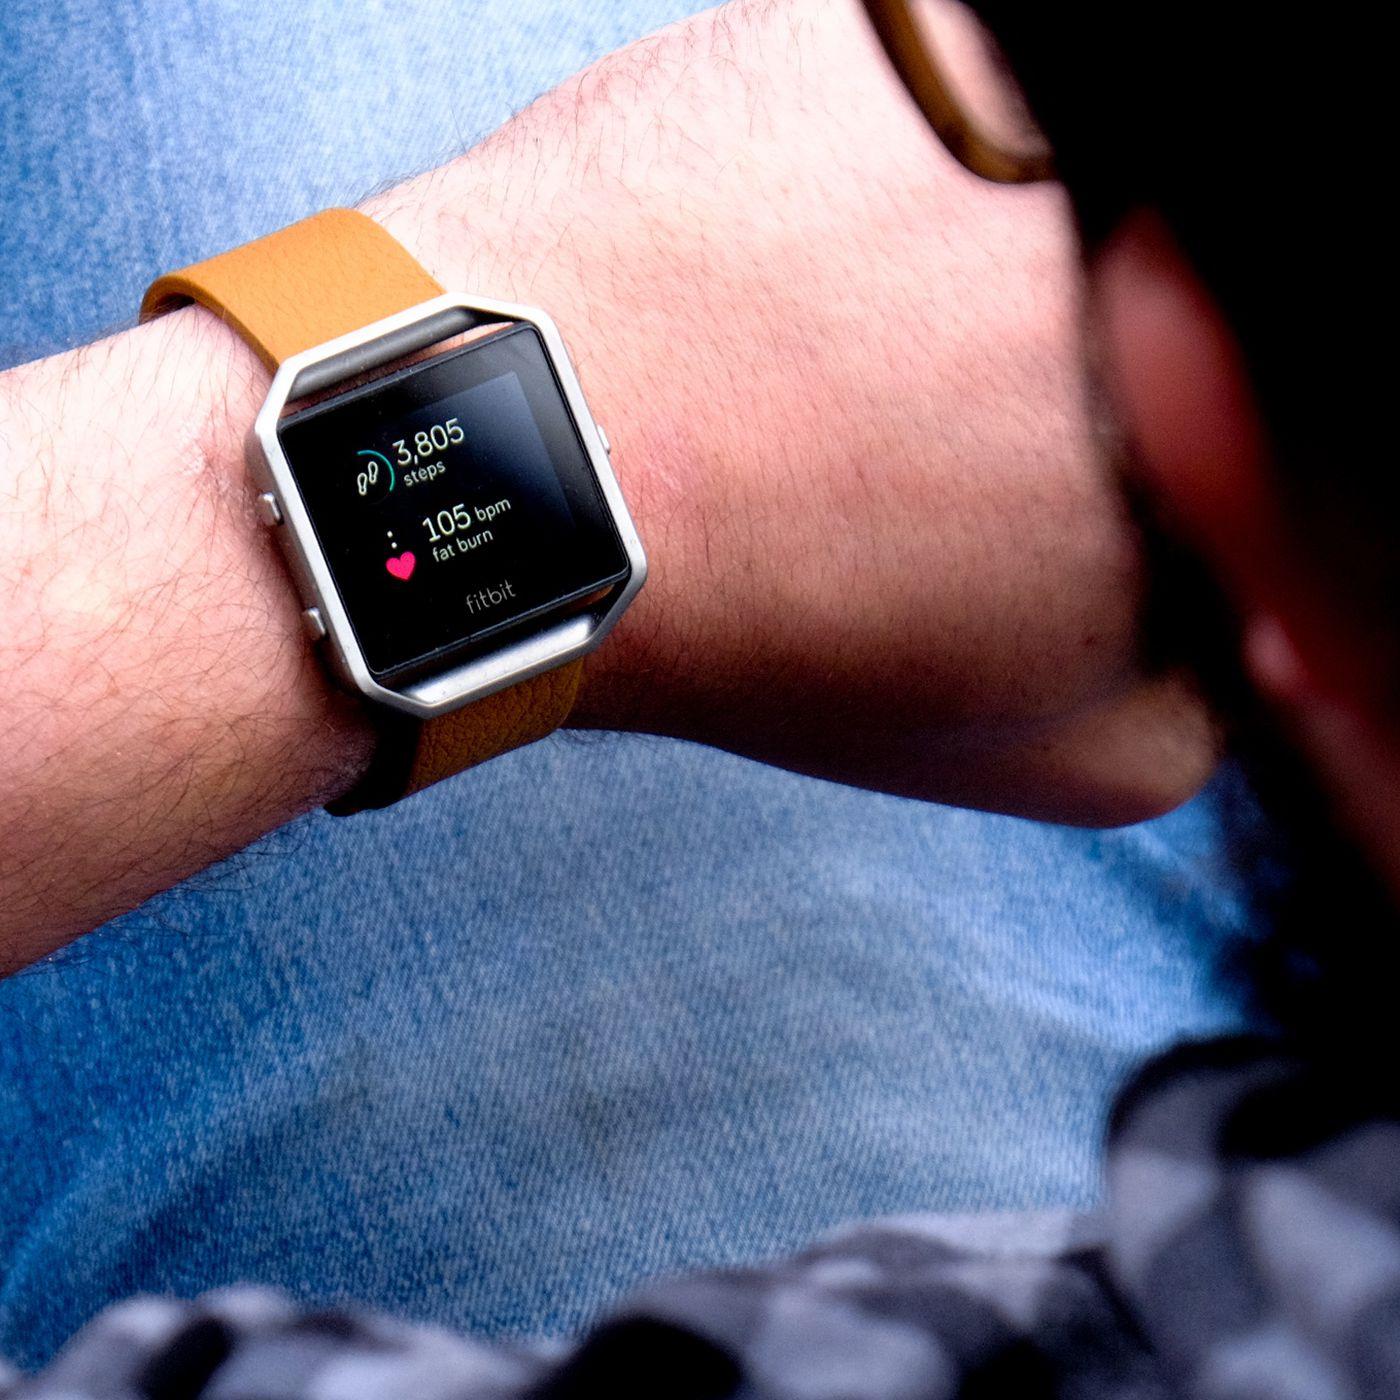 Fitbit Blaze review: a 'smarter' fitness tracker is still kind of